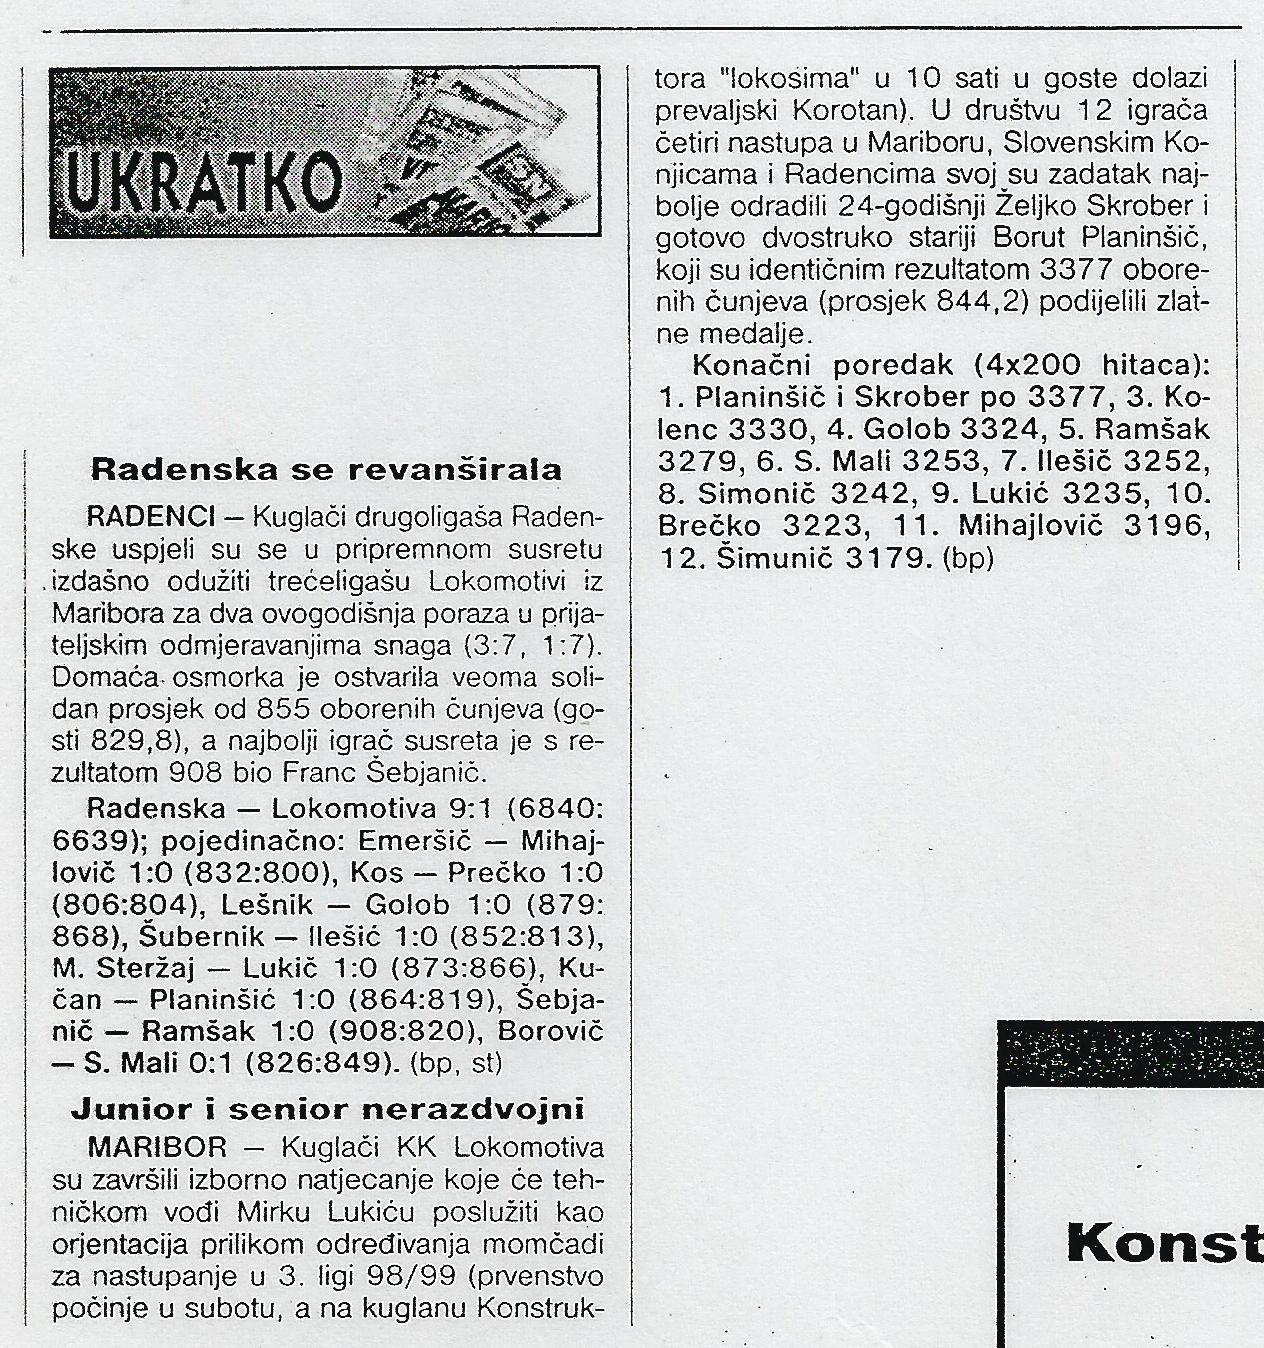 Sportske Novosti, 1998